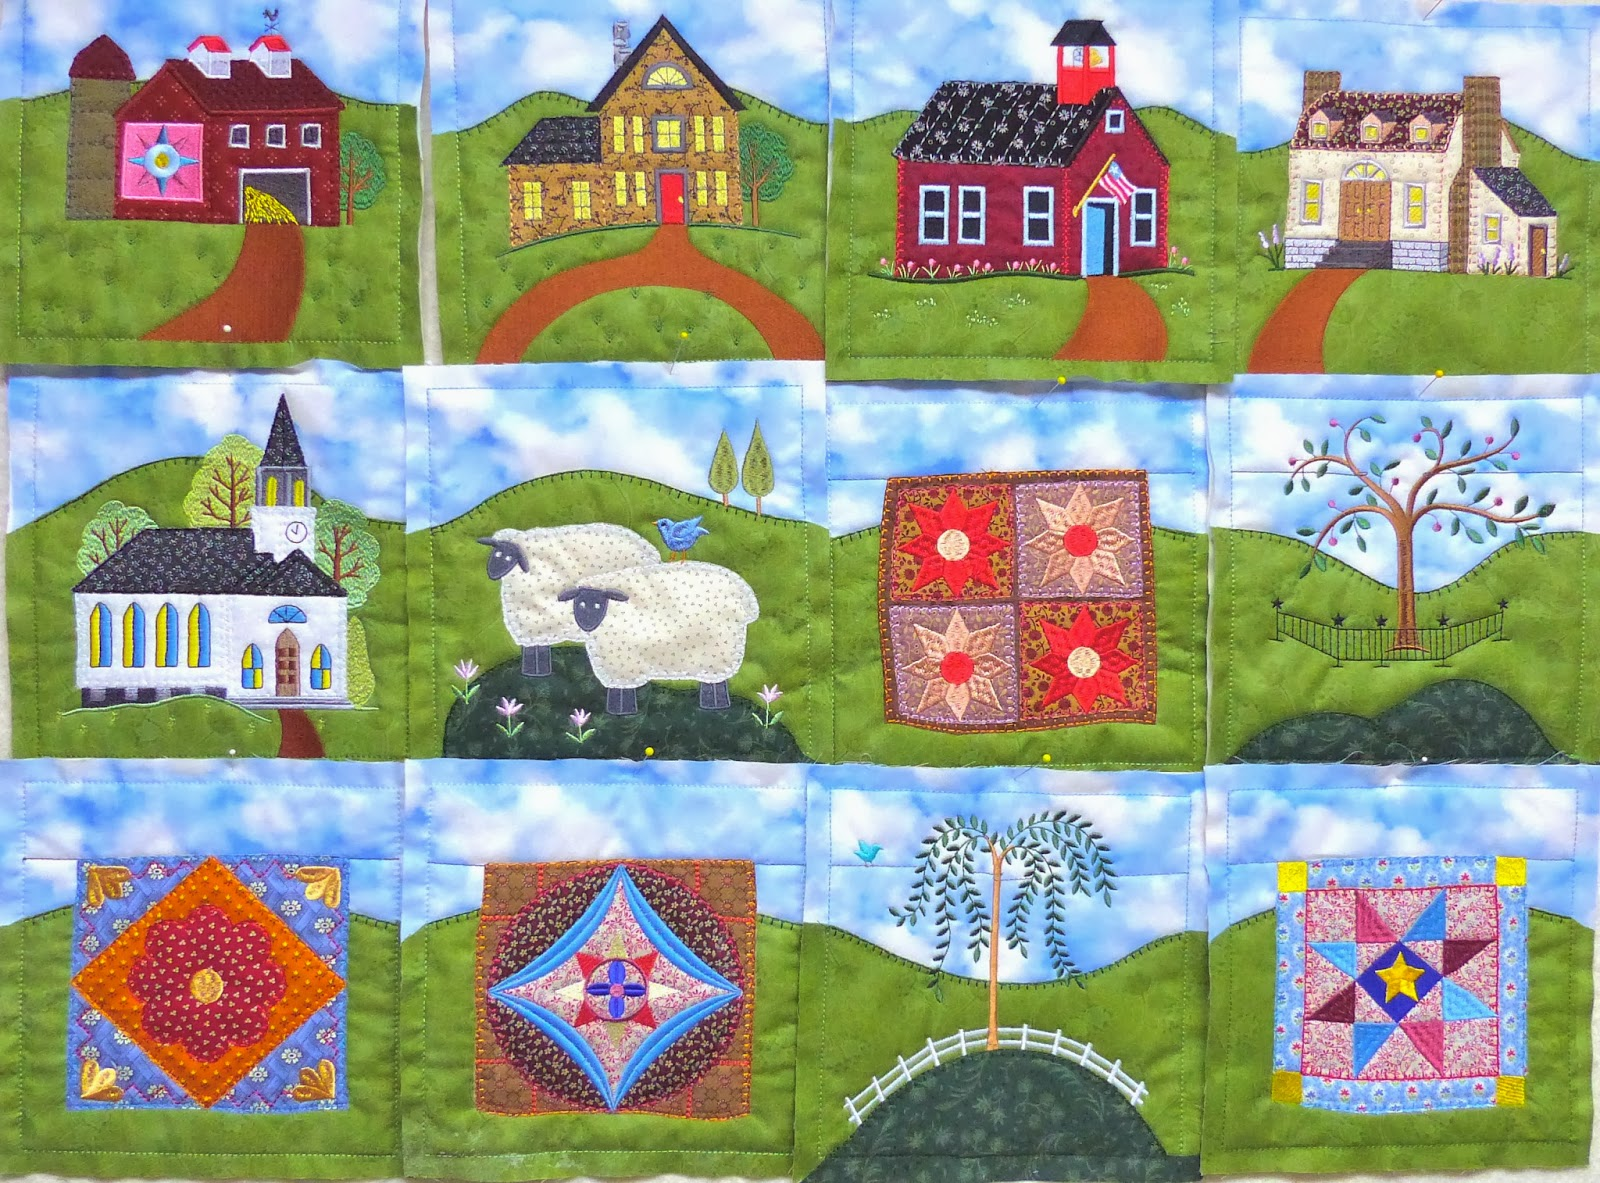 Timber Hill Threads 12 Anita Goodesign Homestead Quilt Blocks